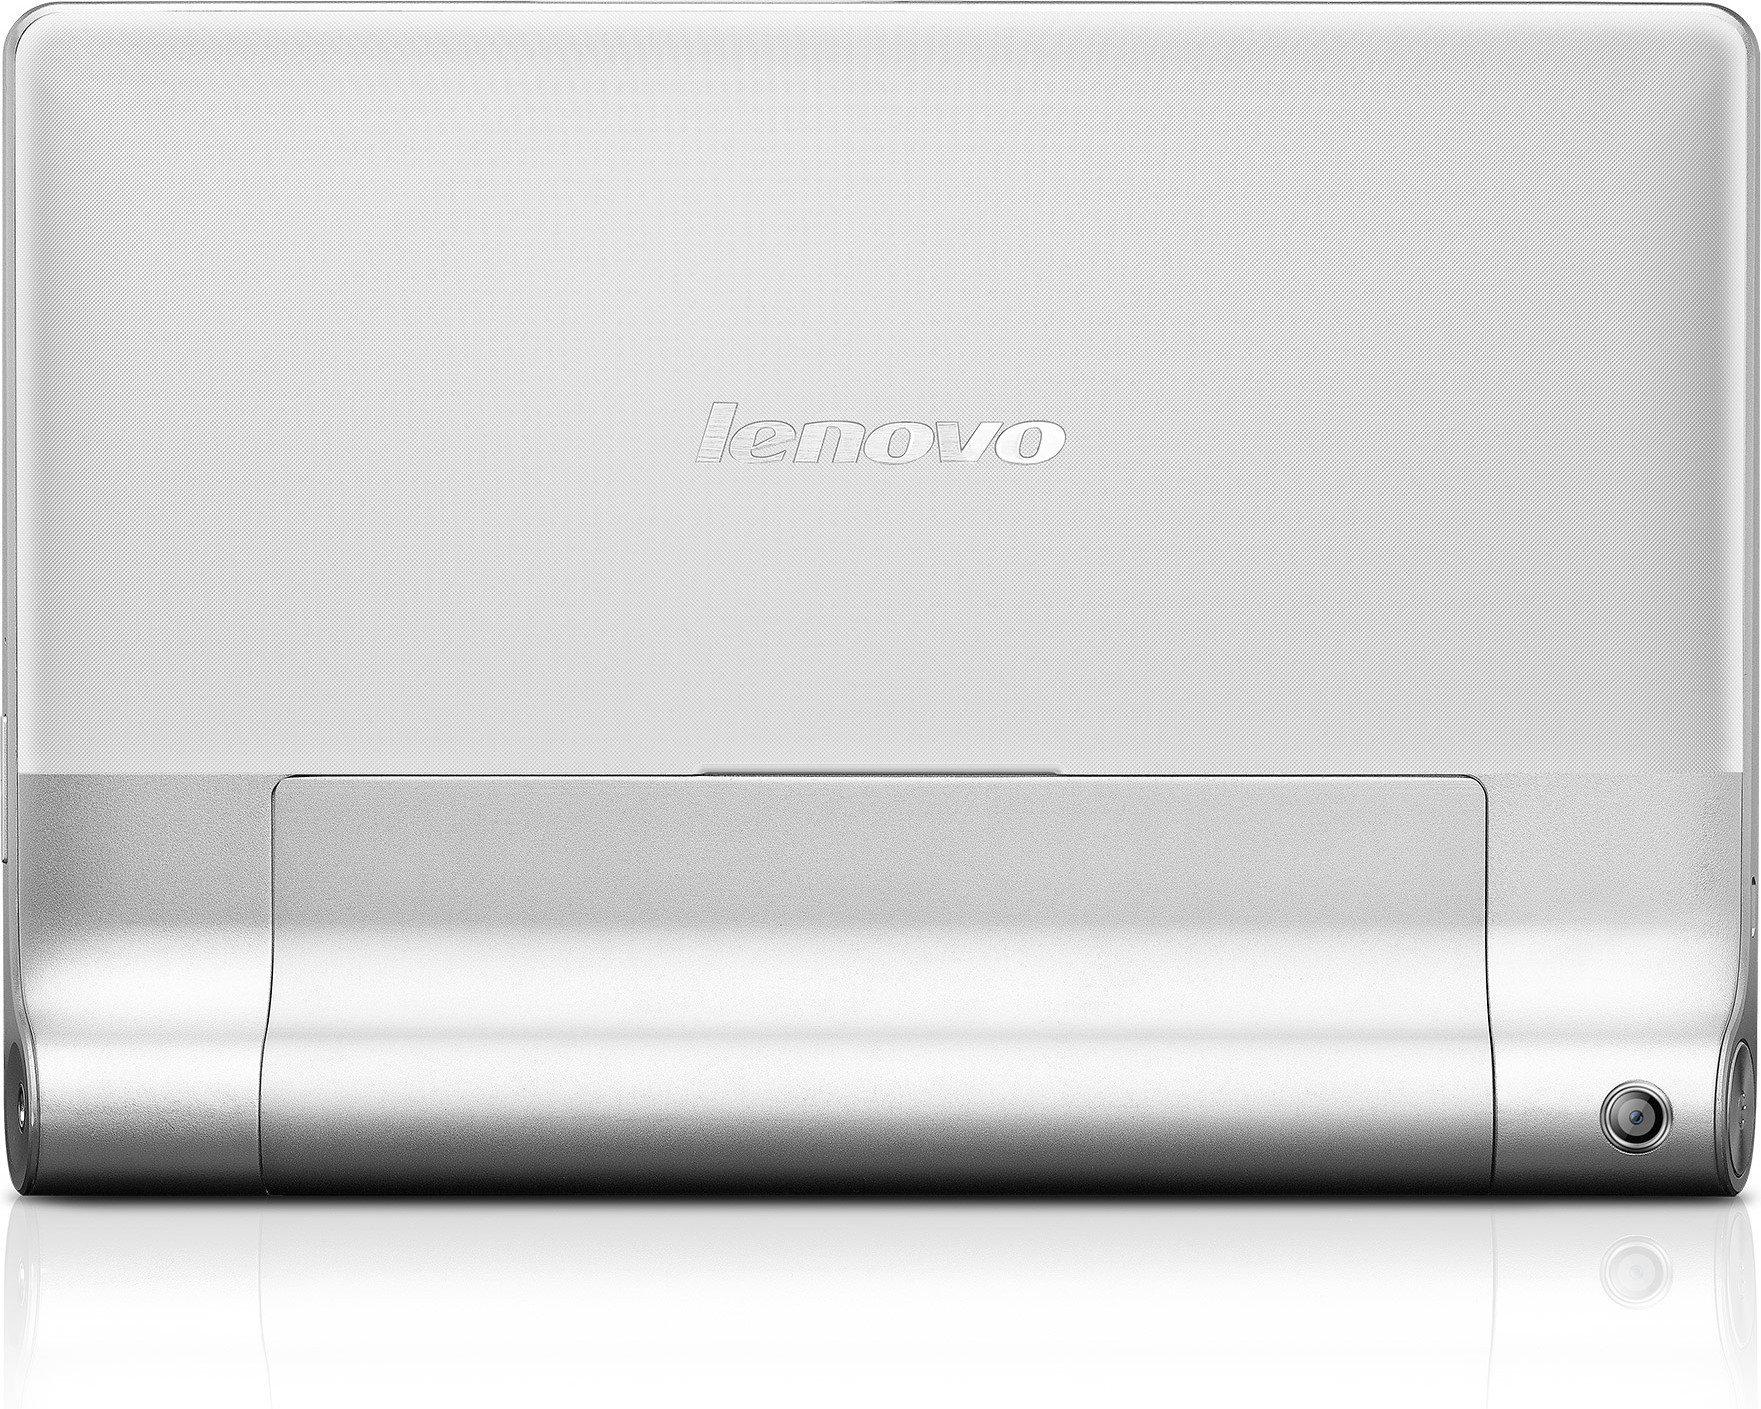 Lenovo IdeaTab Yoga B6000 3G